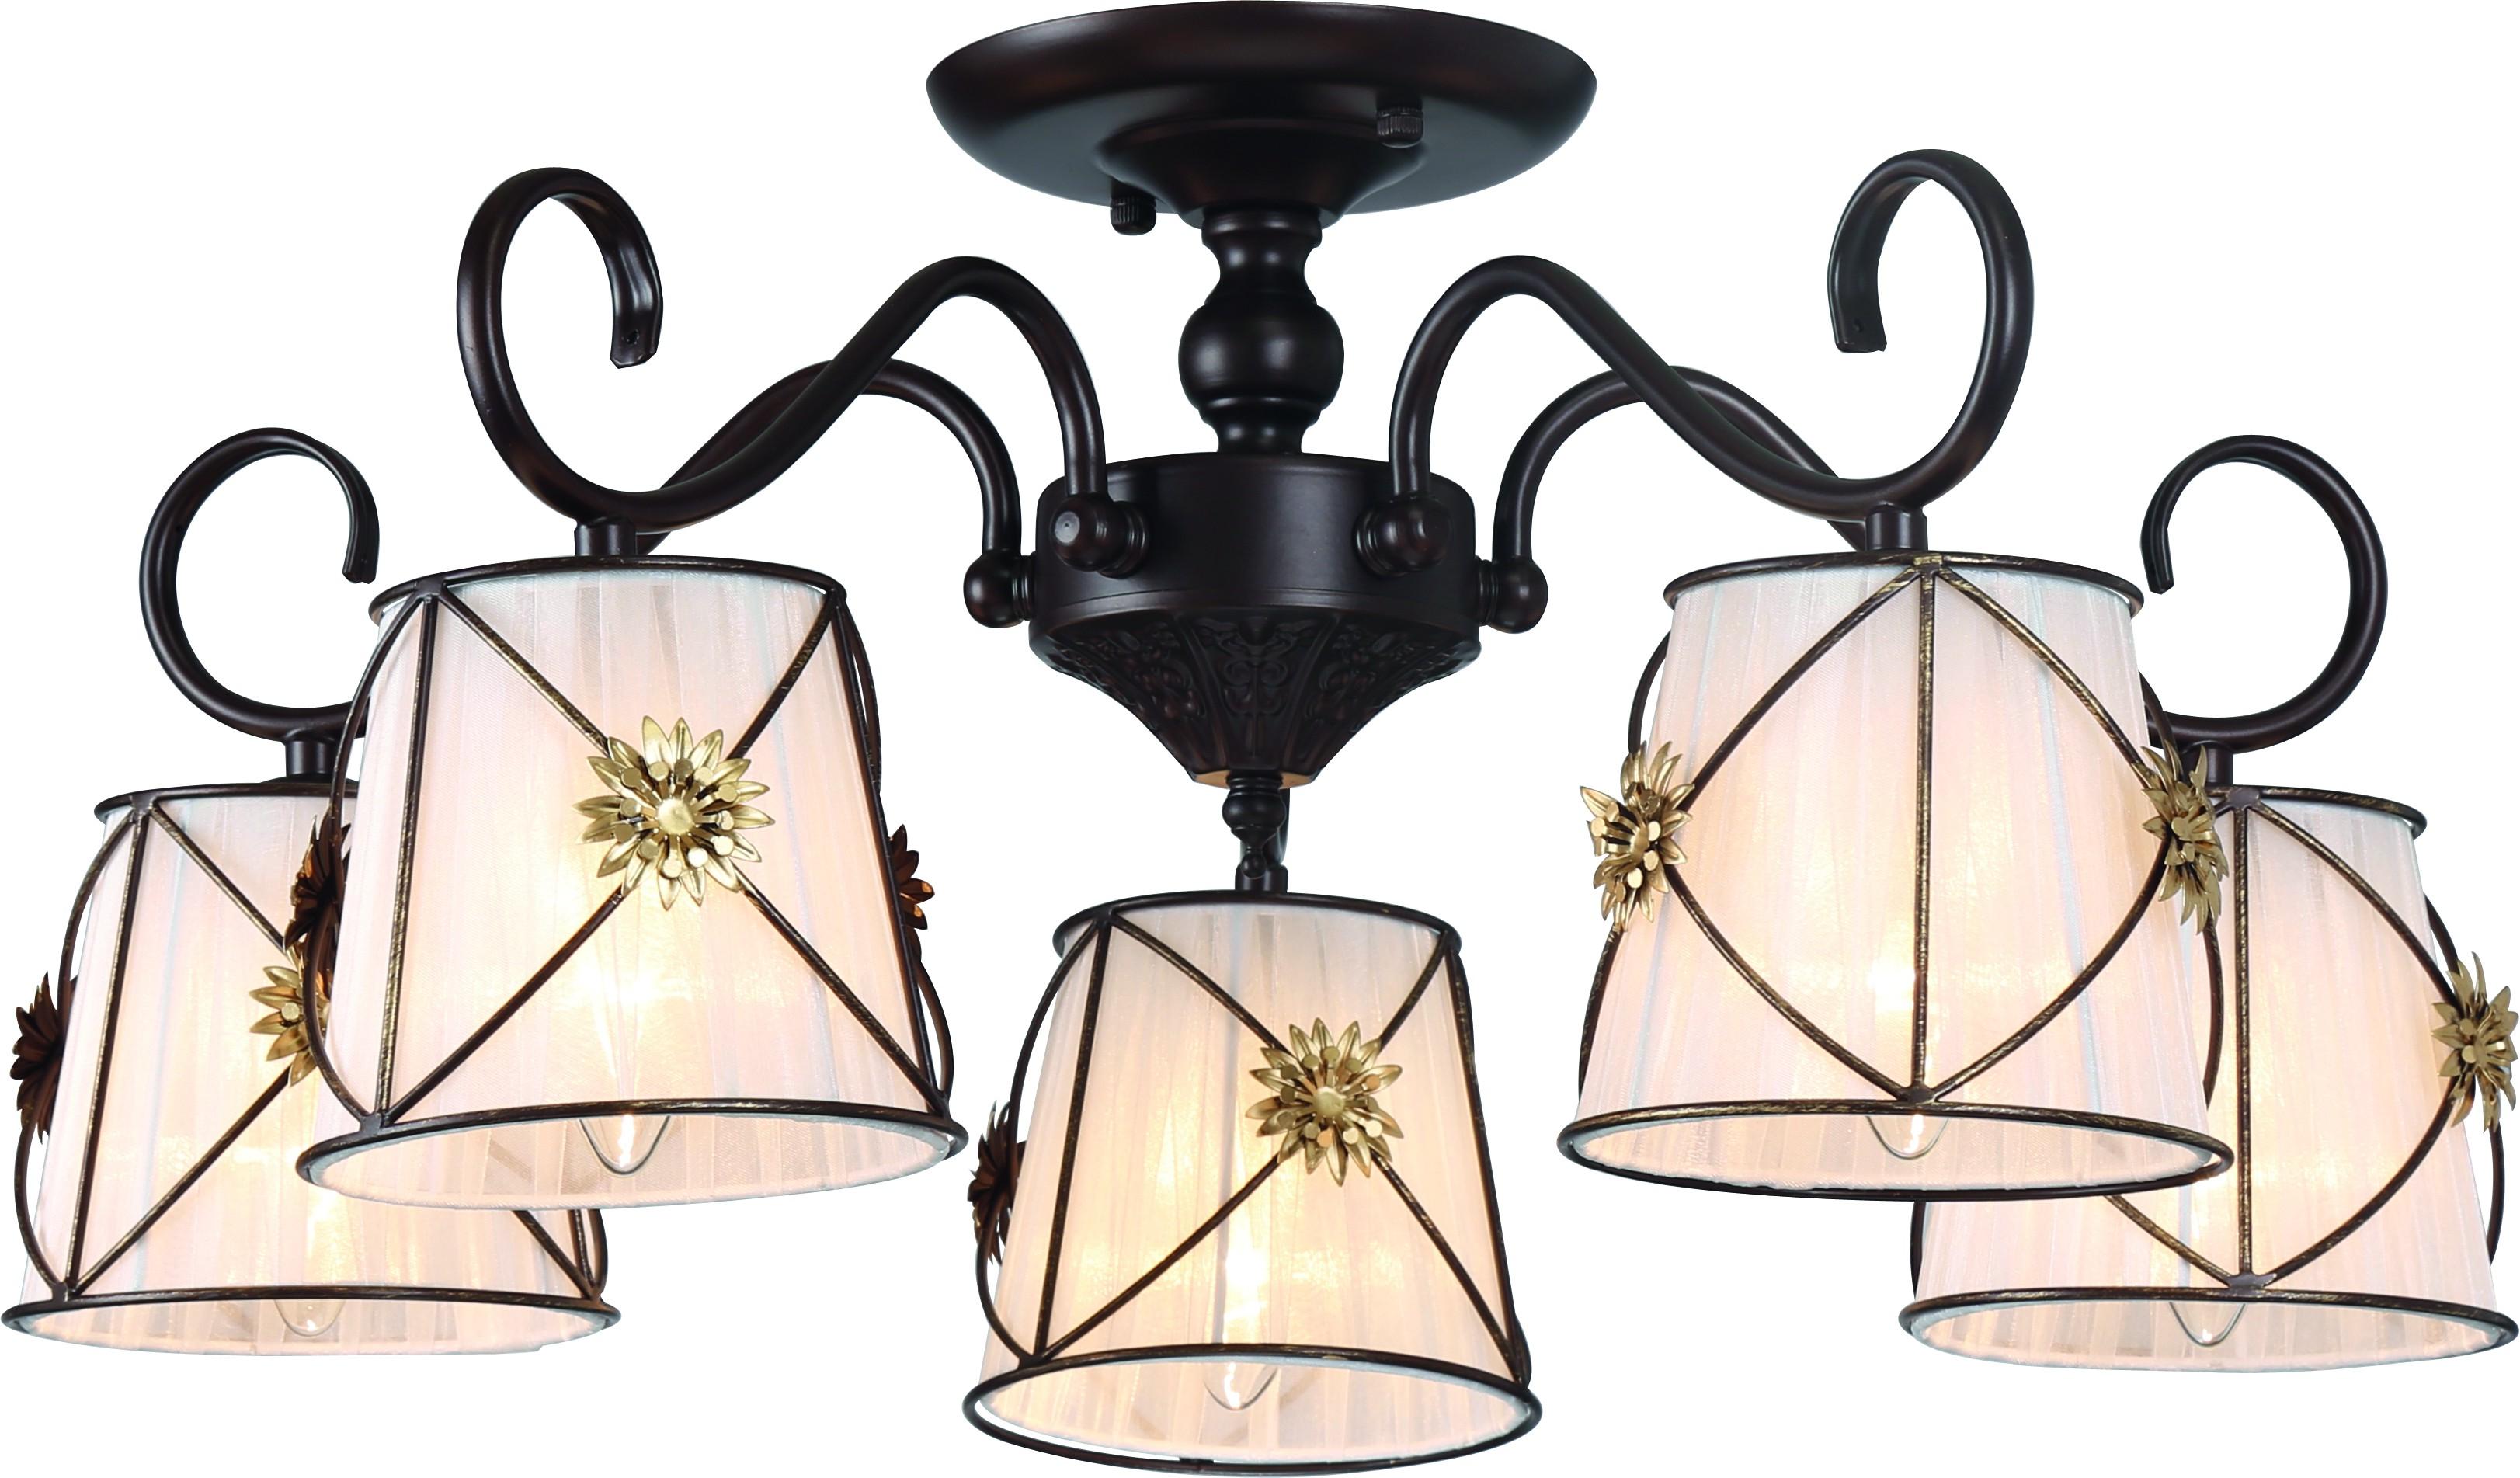 Люстра Arte lamp A5495pl-5br люстра на штанге arte lamp aroma a6582pl 5br